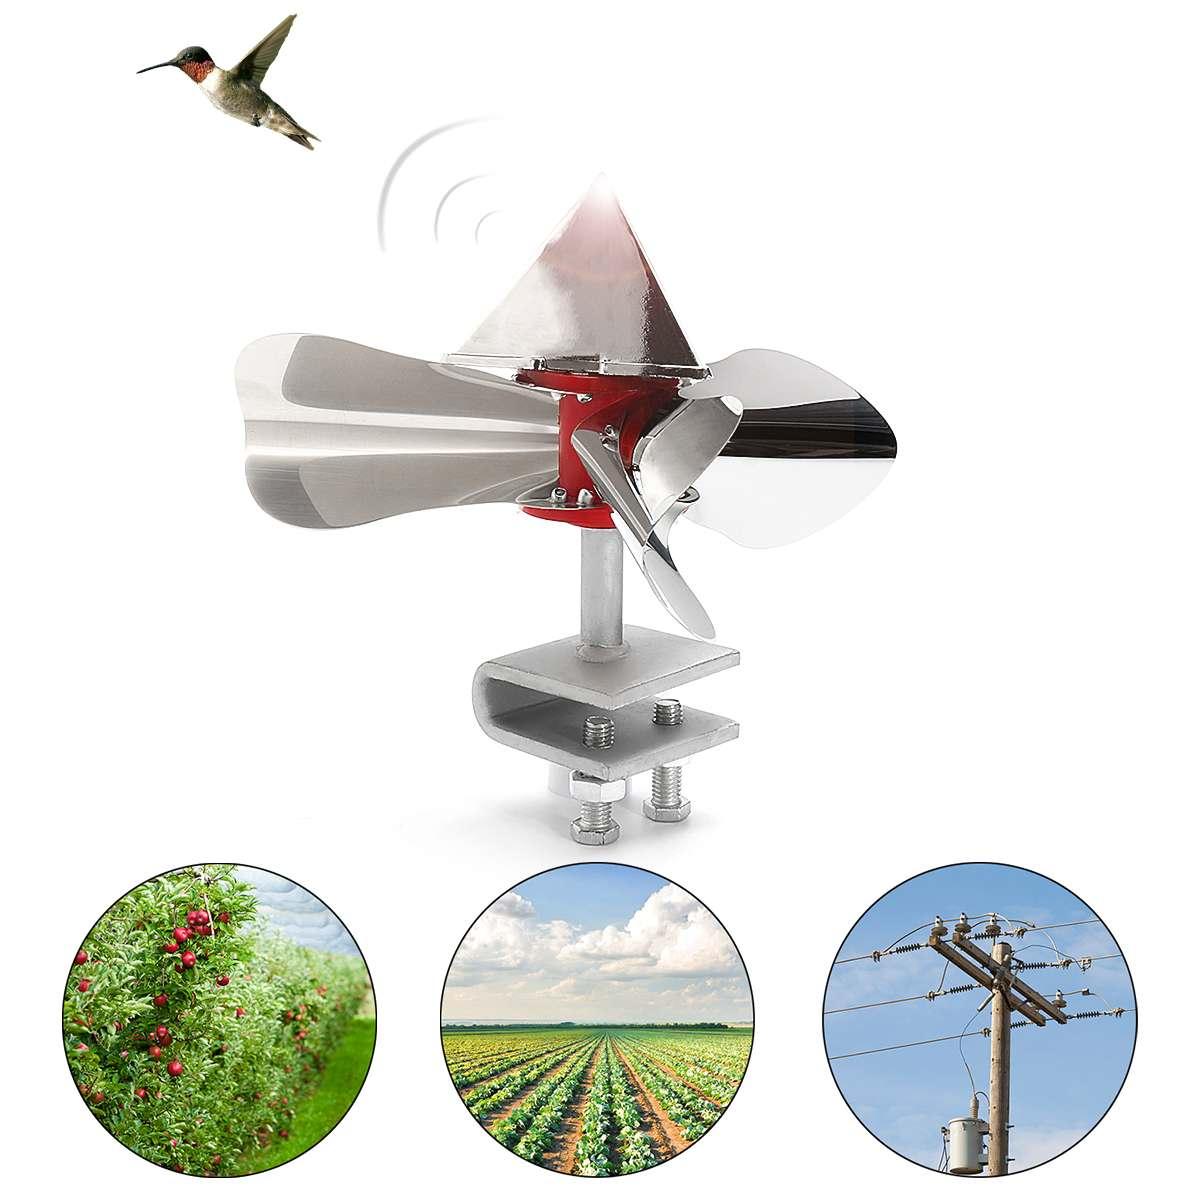 Wind Power Bird Scarer 360 Degree Reflective Birds Repellents Decoy Outdoor Stainless Steel Orchard Garden Pest Control